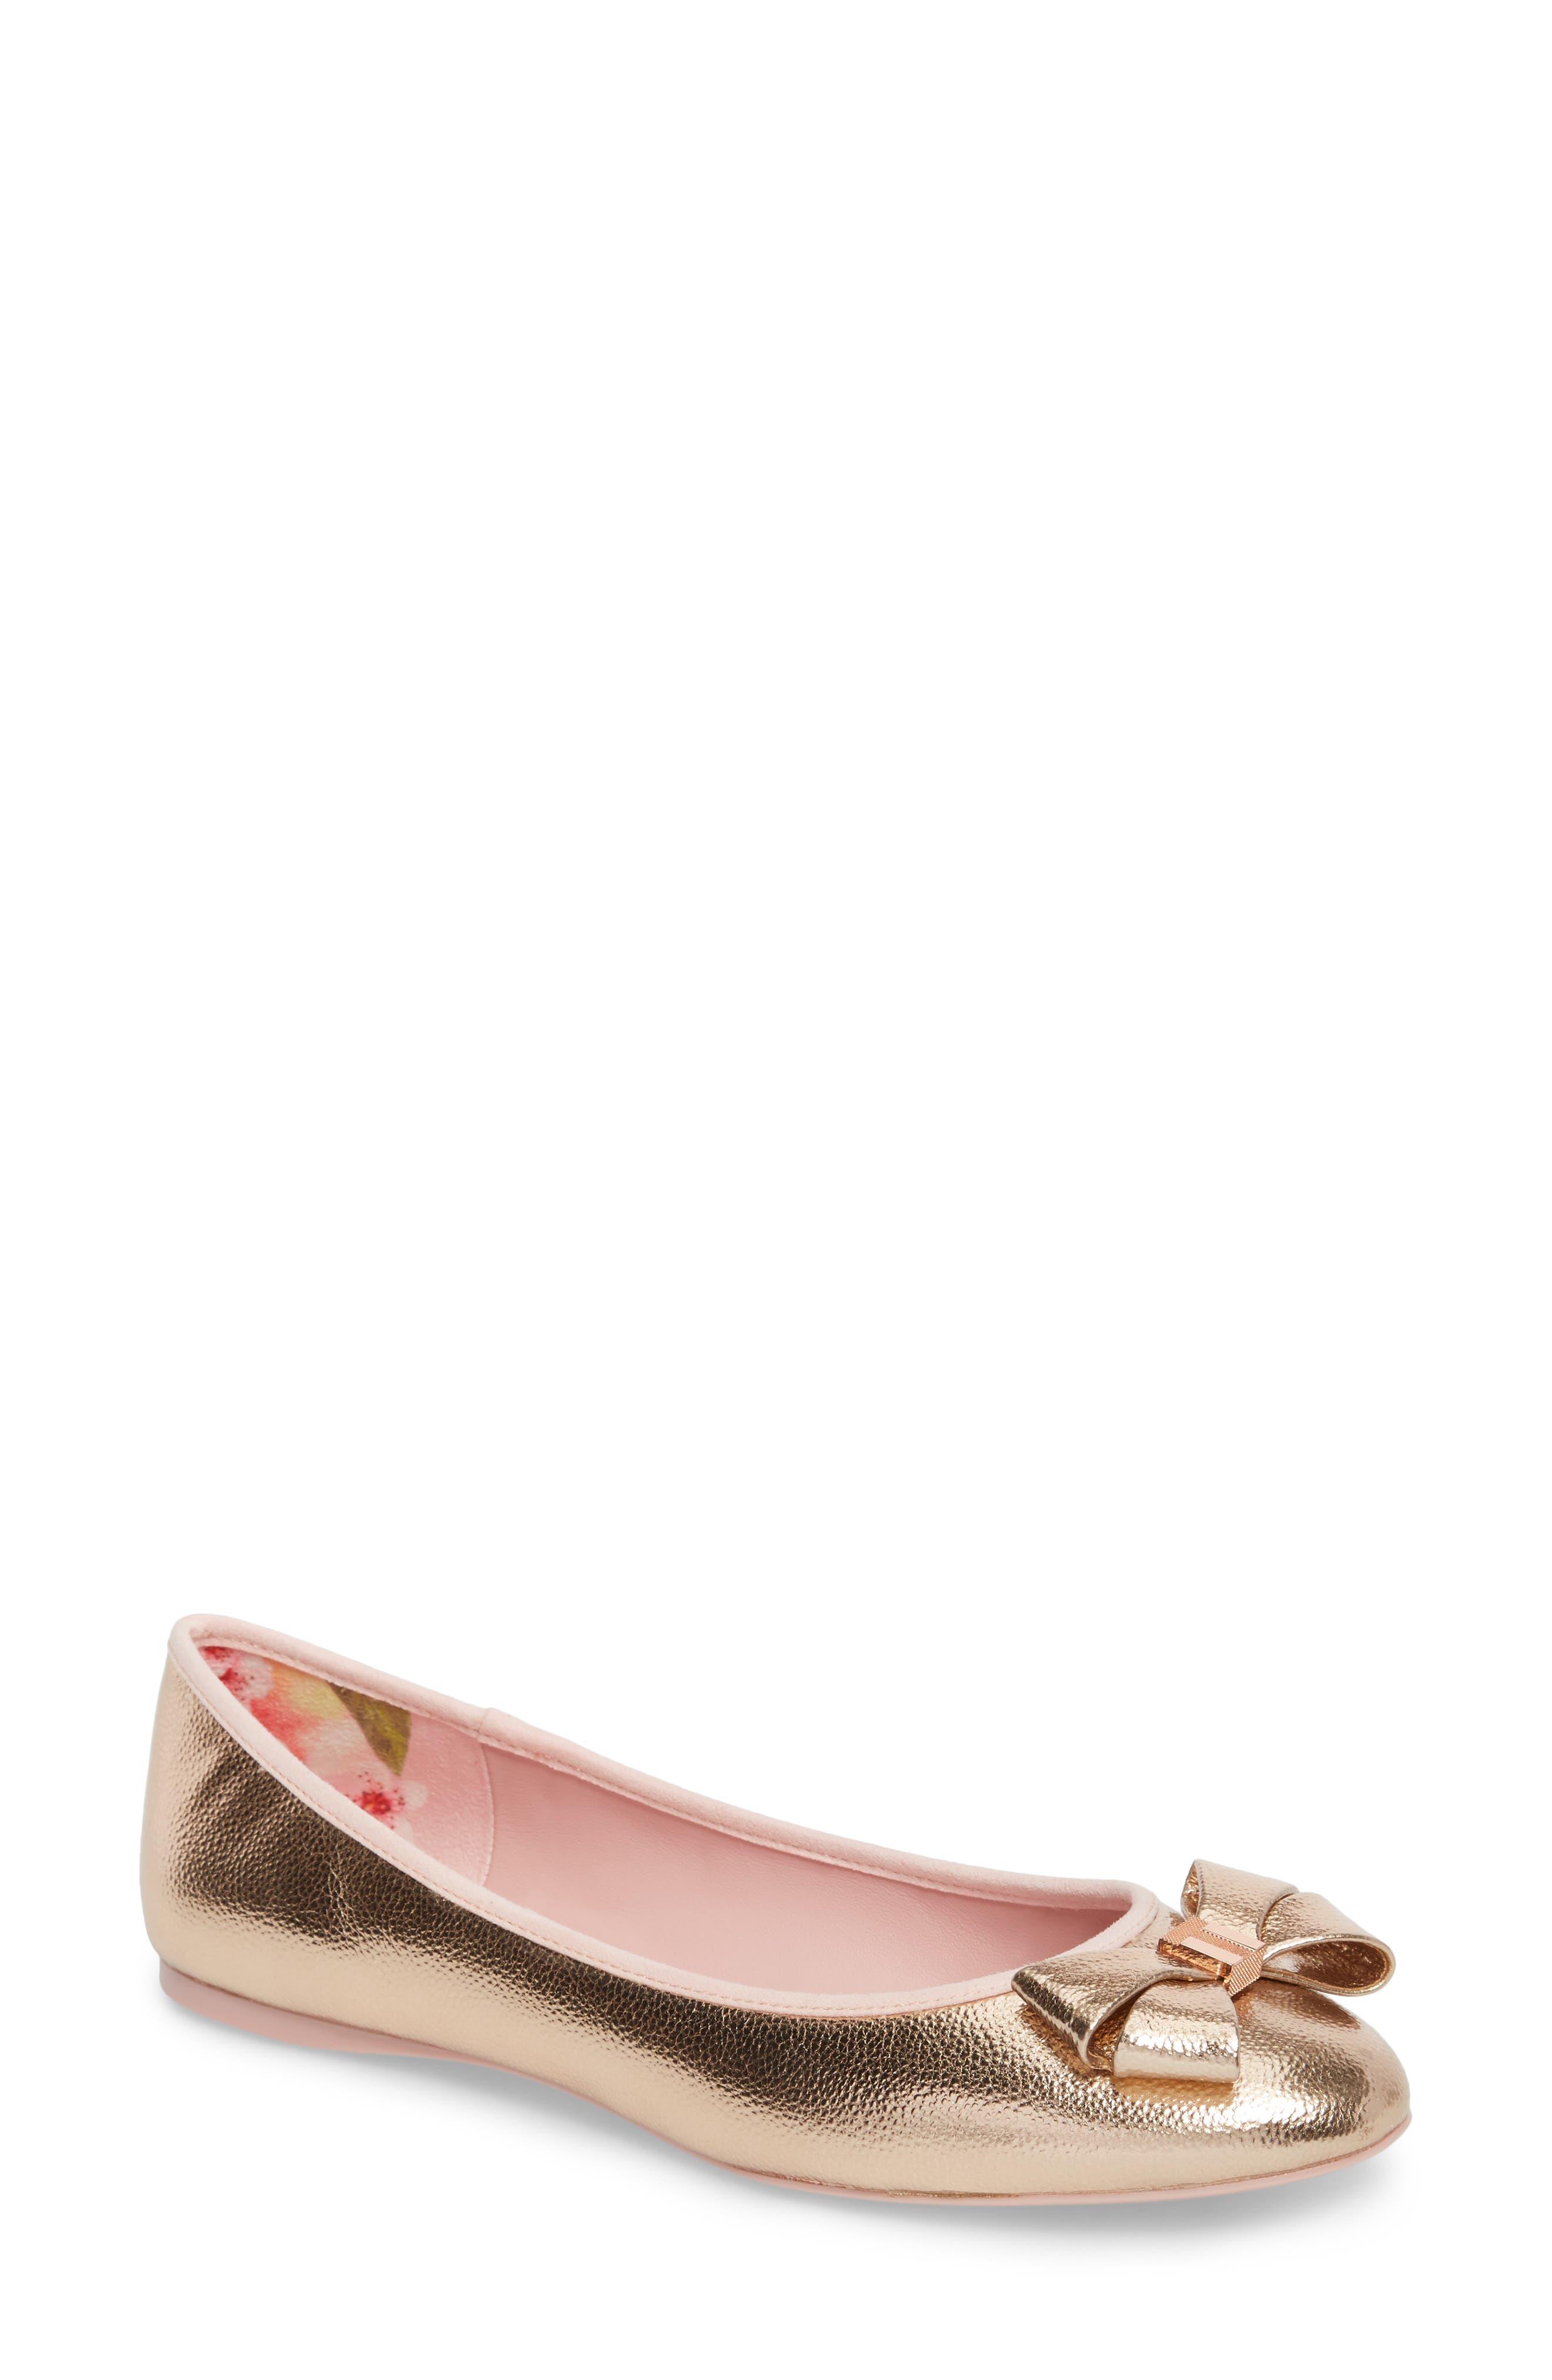 Immet Ballet Flat,                             Main thumbnail 1, color,                             ROSE GOLD